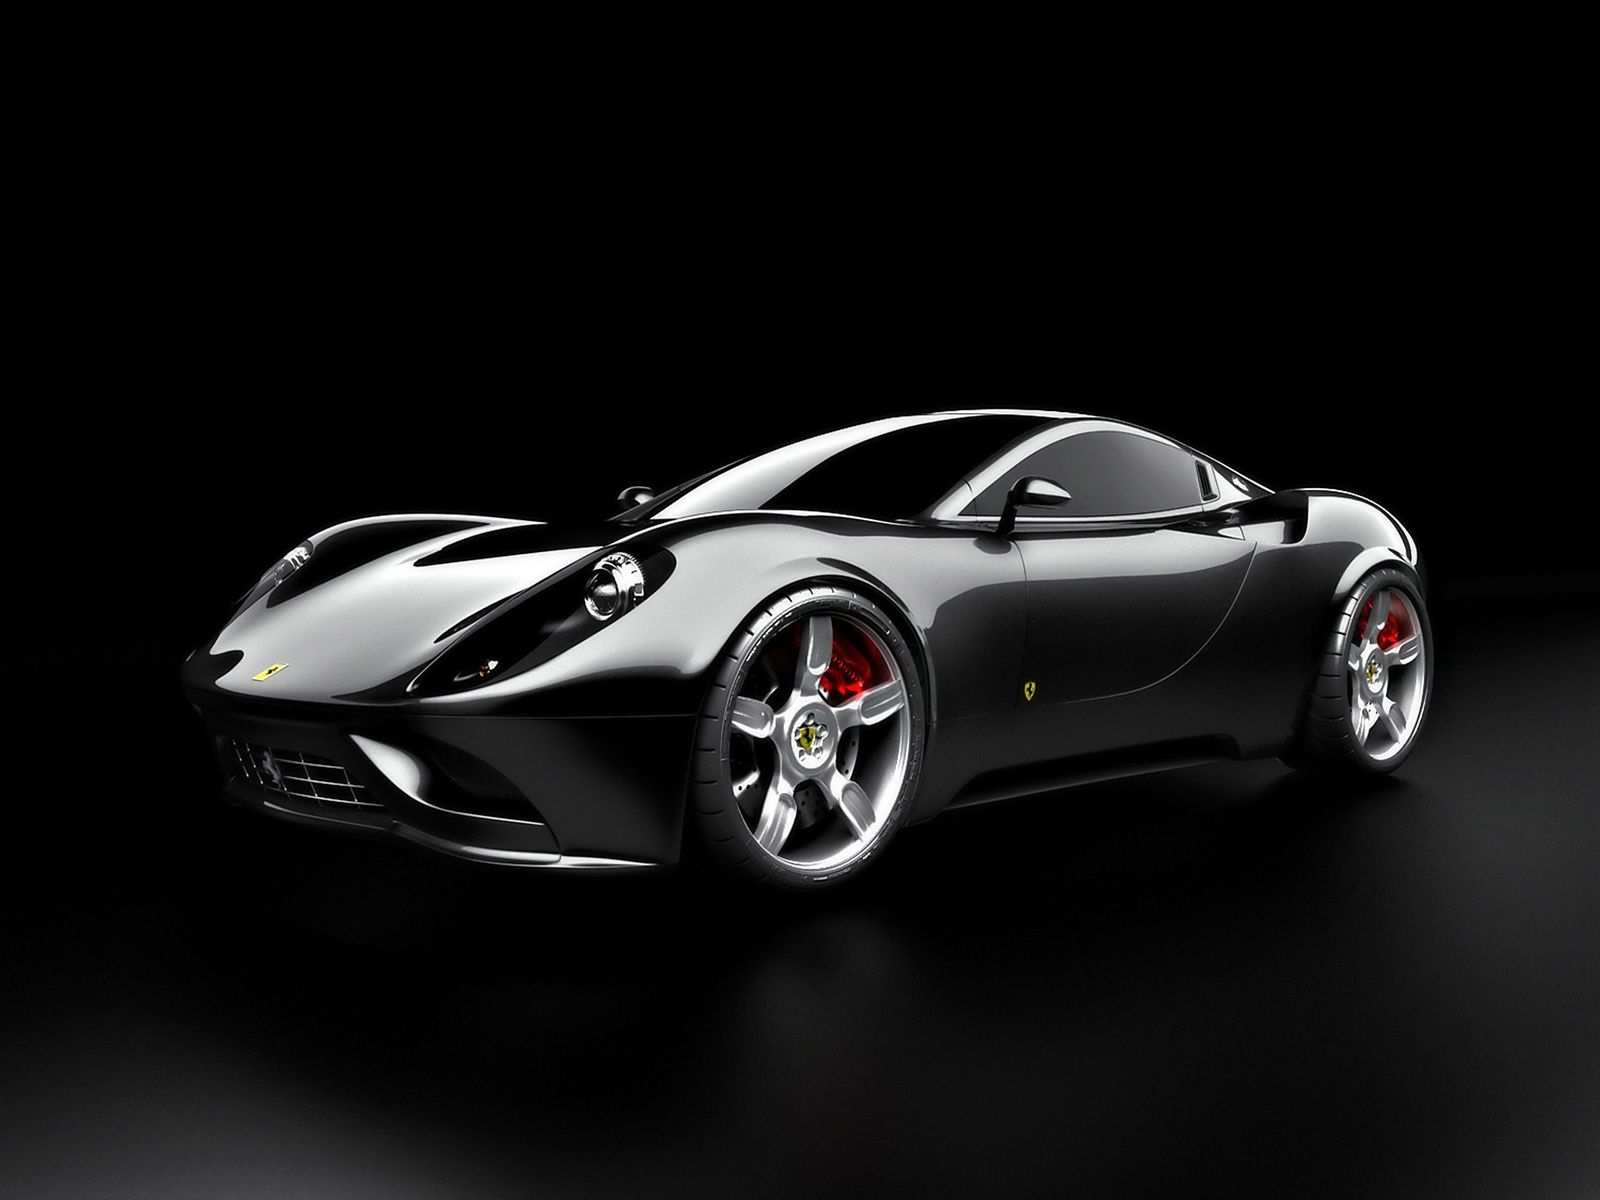 Black Ferrari Car Wallpaper 07 1600x1200 340x220